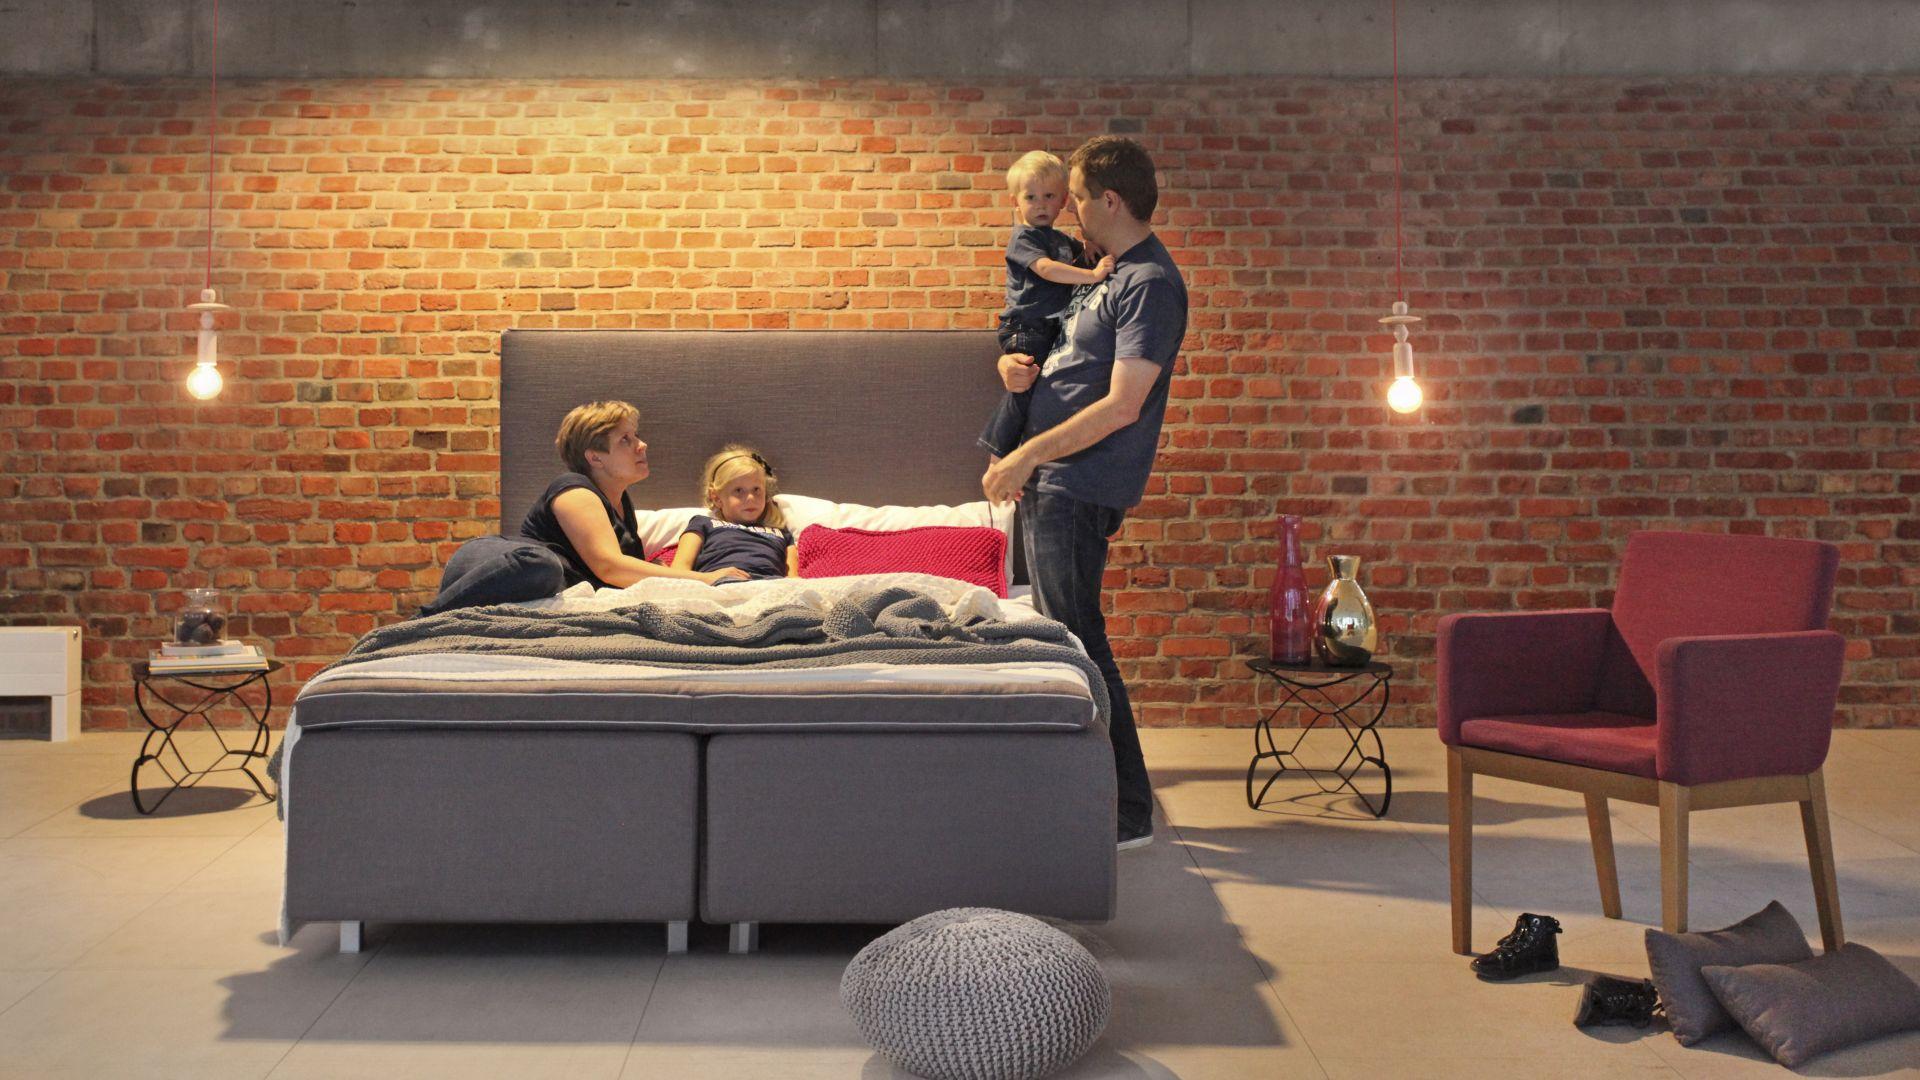 Comfortable loft